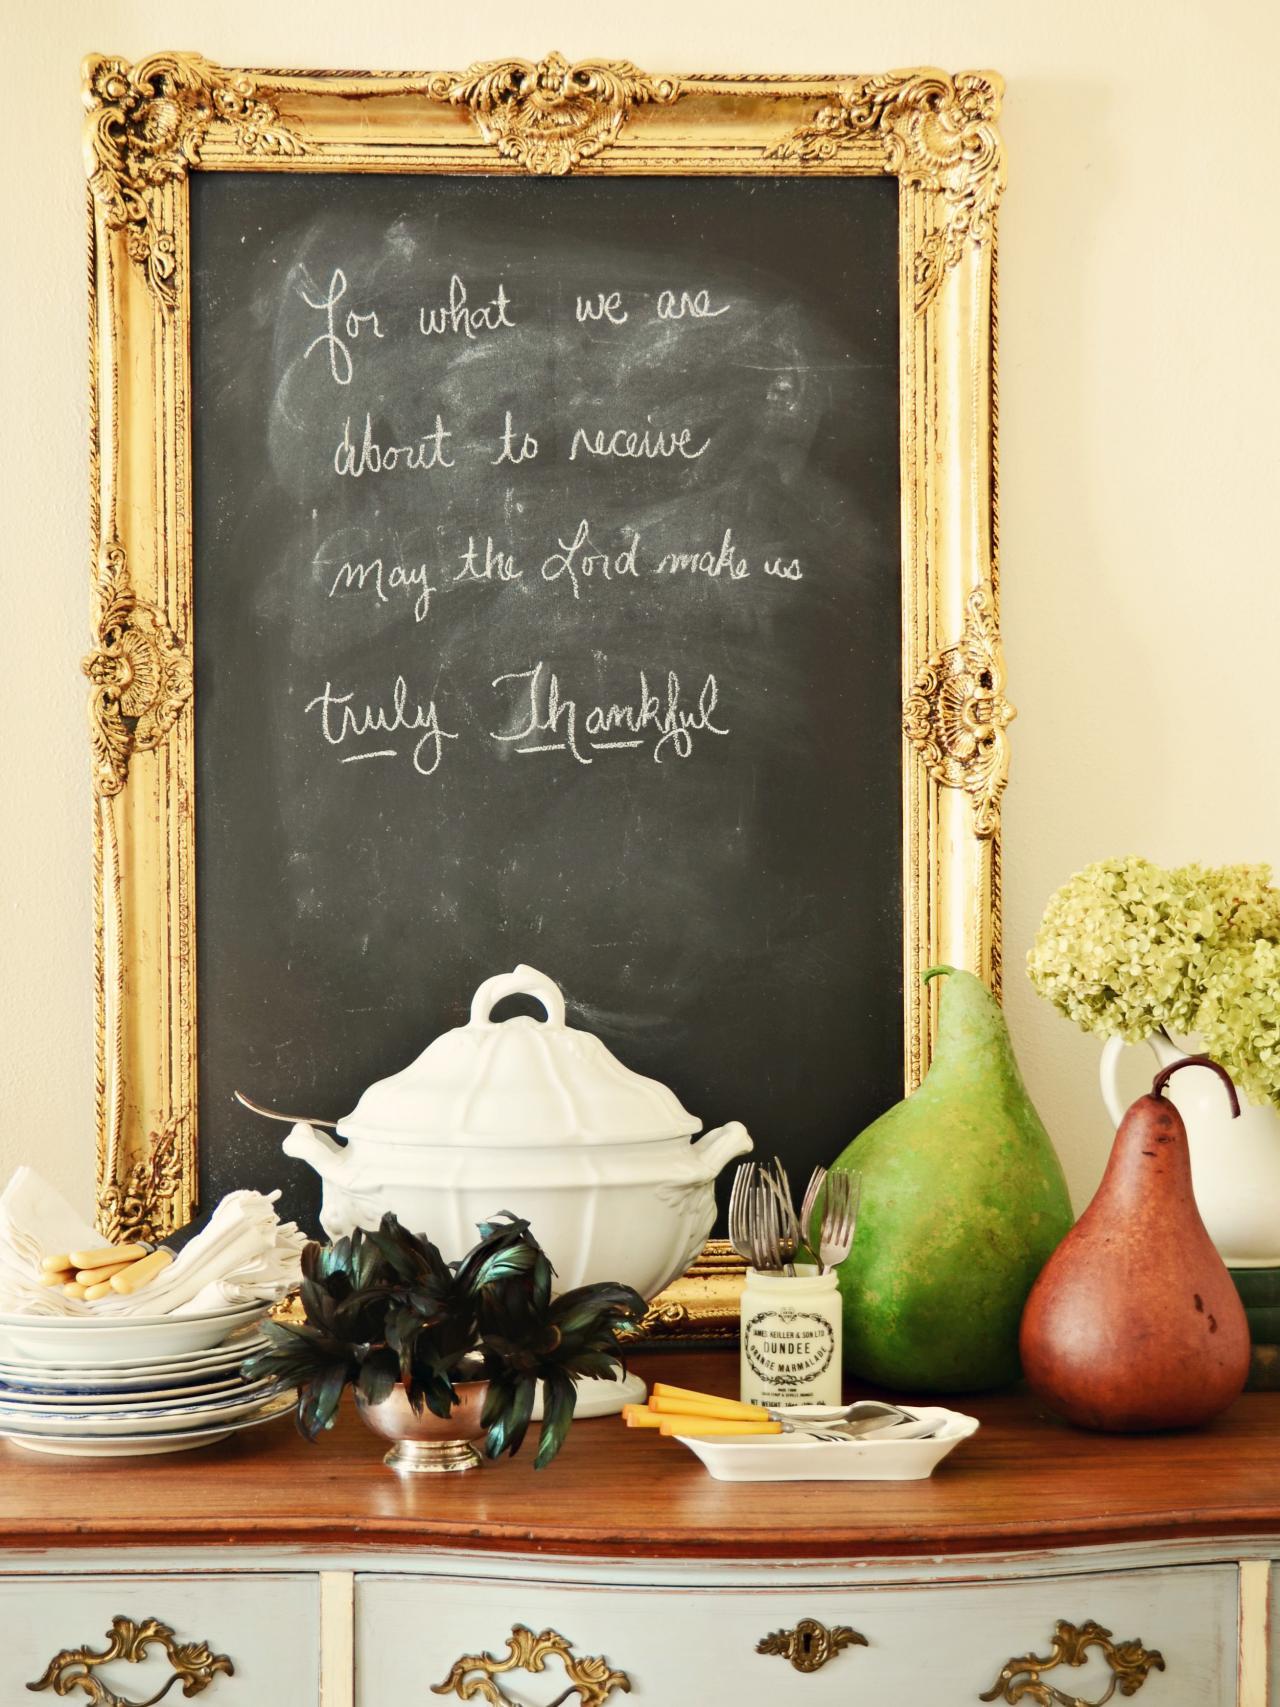 Uncategorized Make Framed Chalkboard how to make an ornate framed chalkboard hgtv gold leaf on buffet table